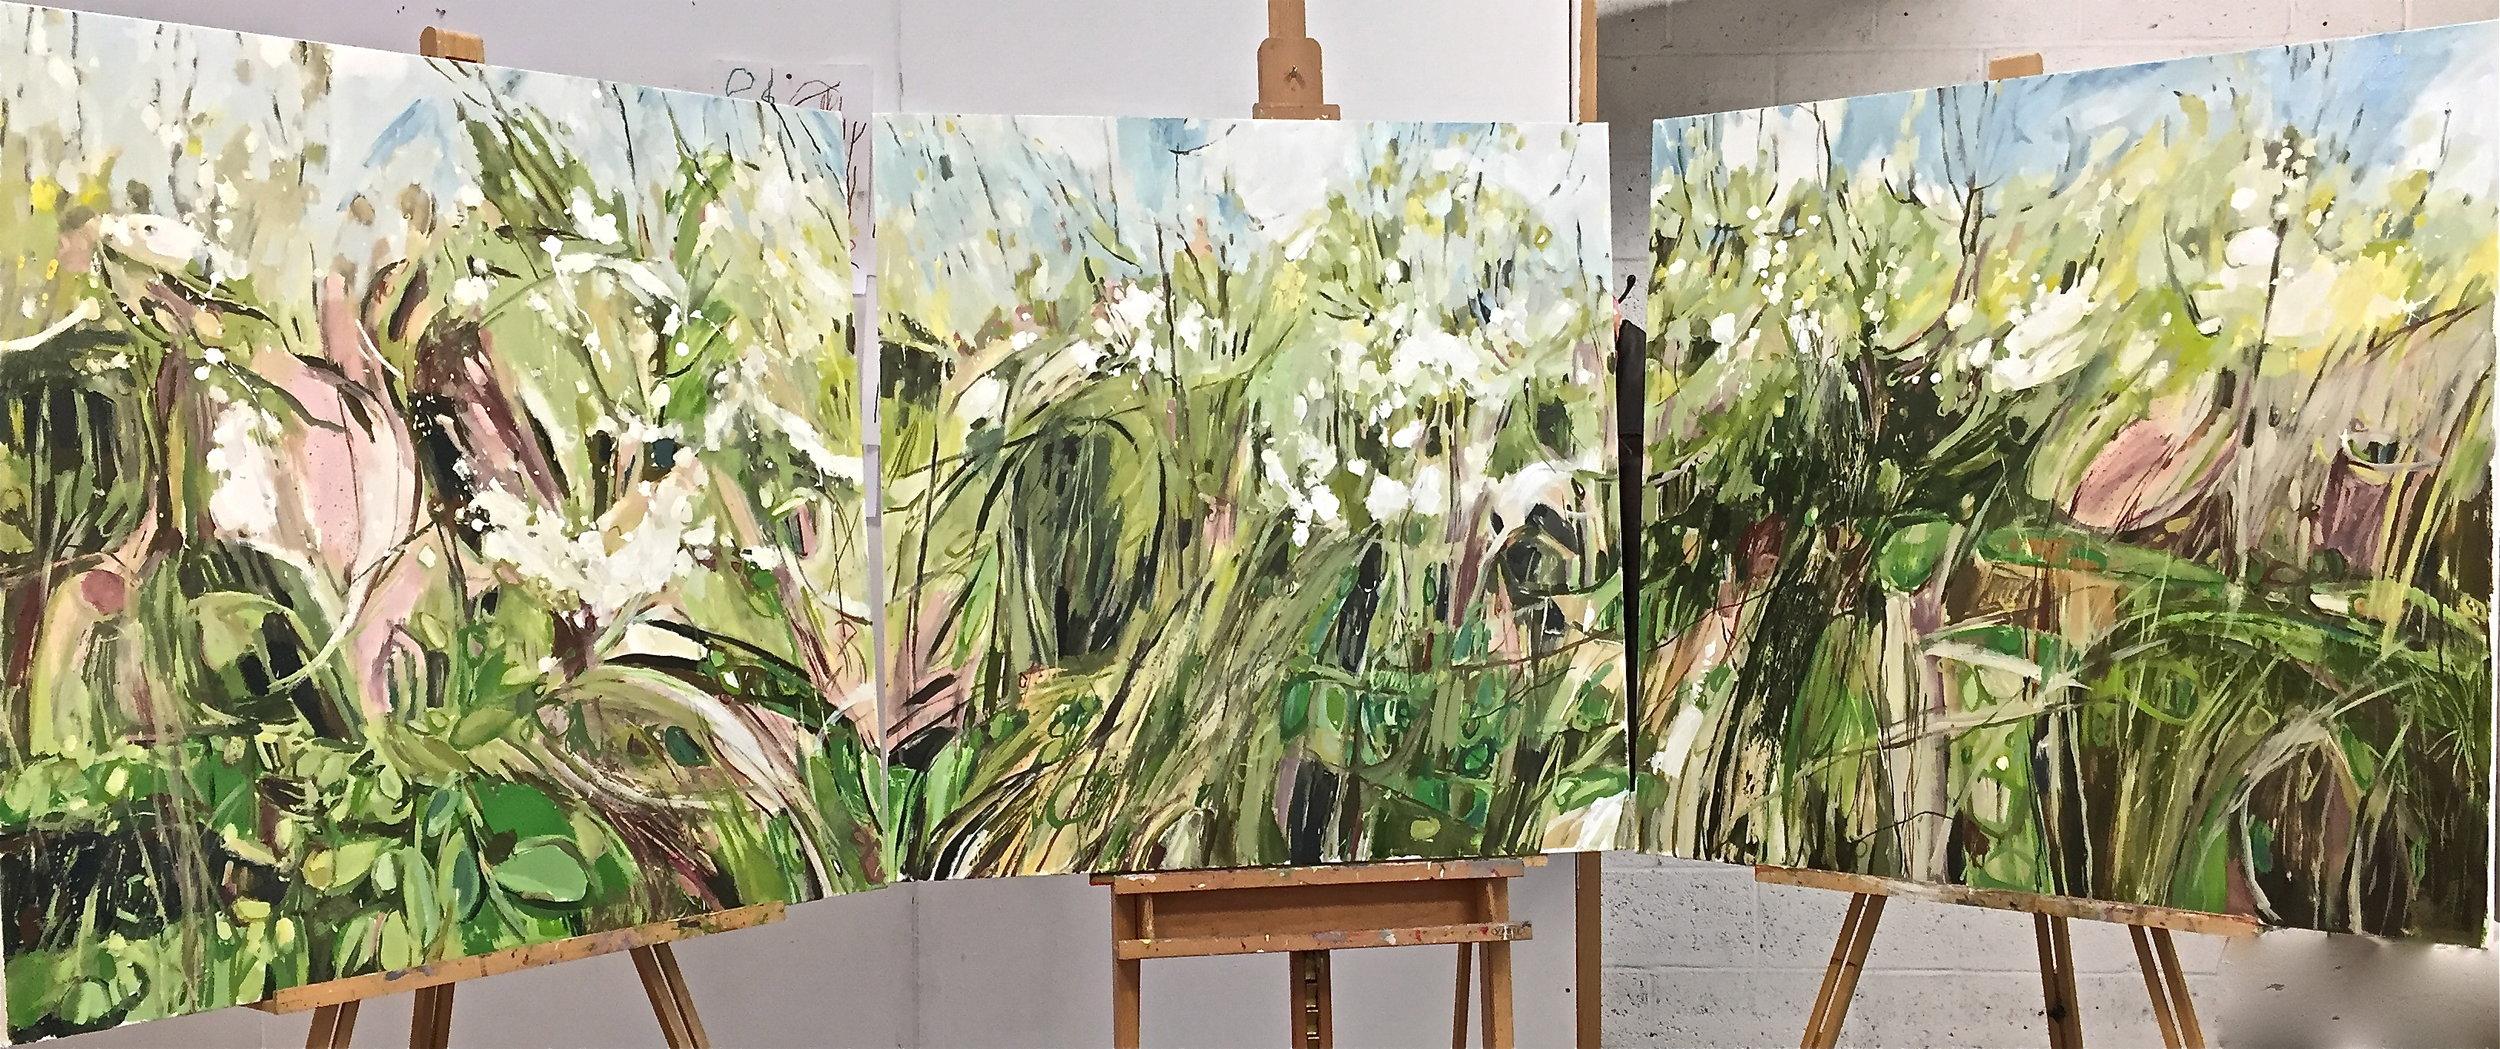 Blackthorn Hedgerow Gunthorpe, complete triptych